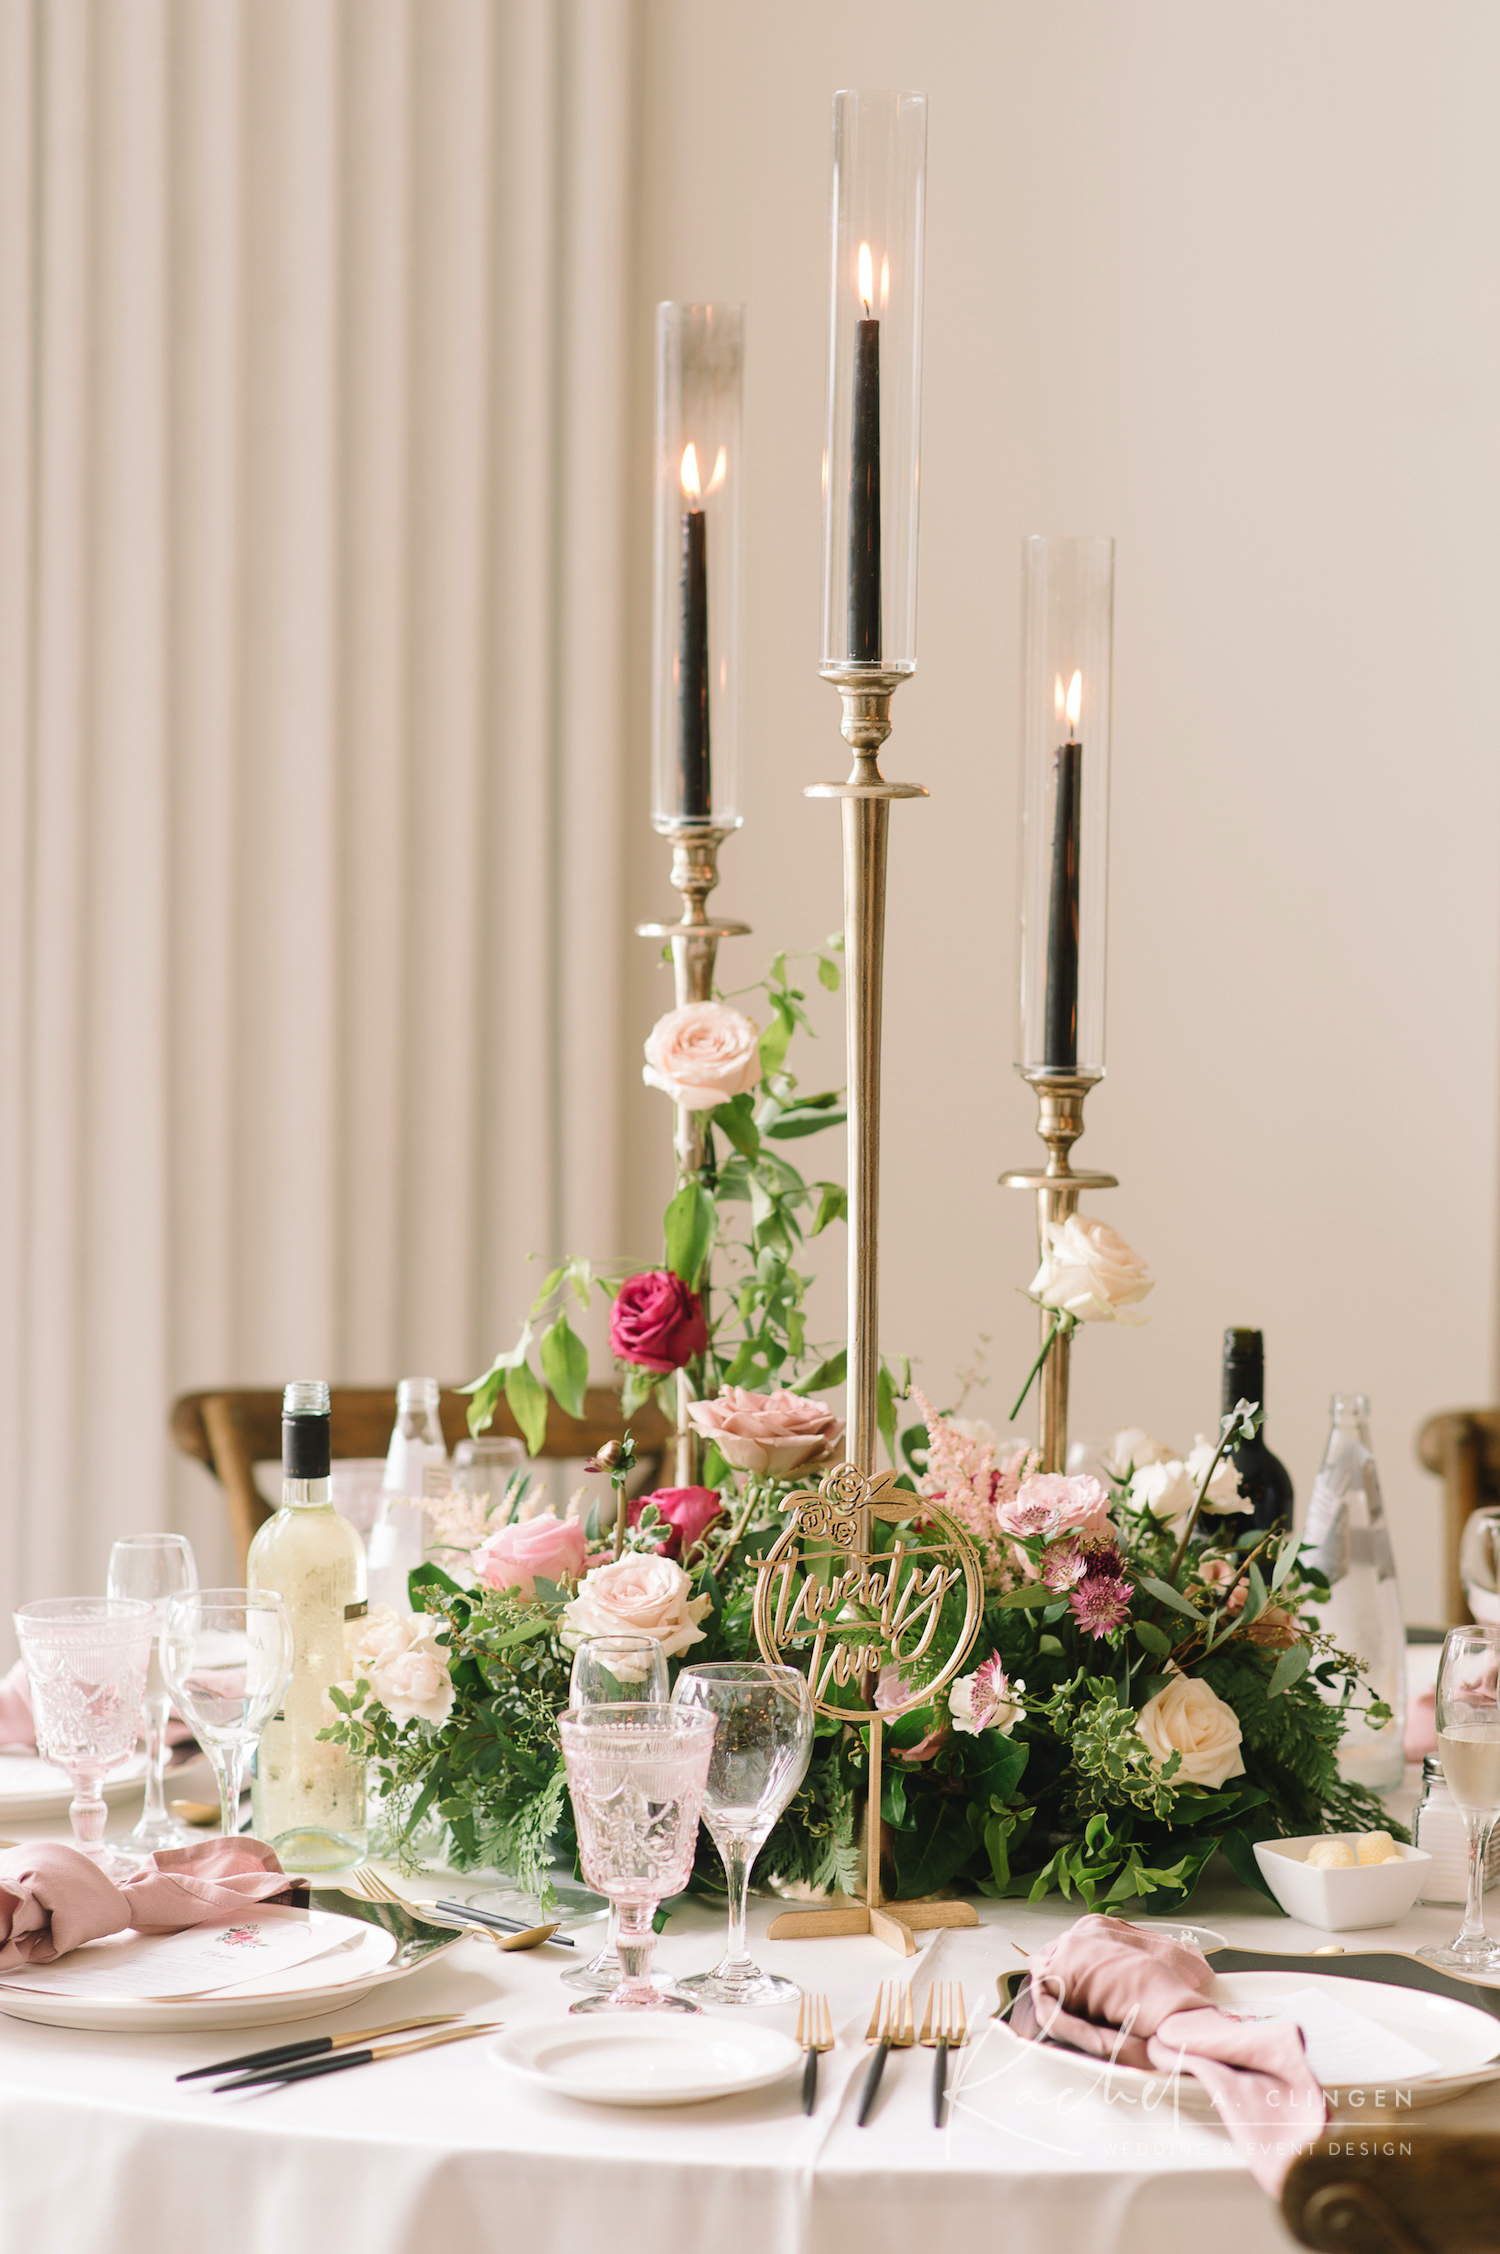 candlestick flowers centrepiece